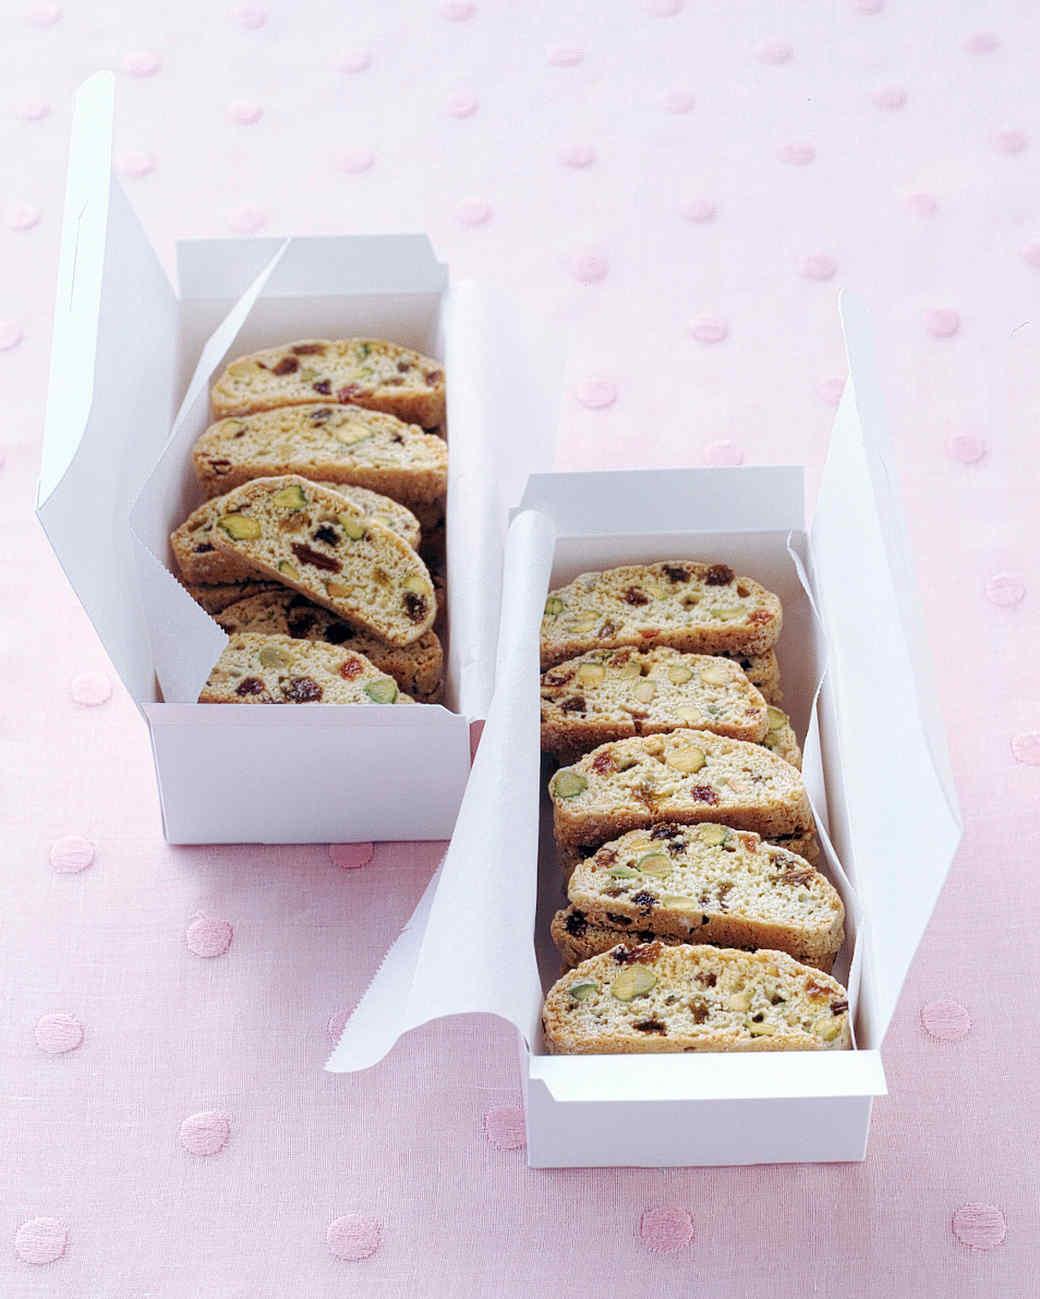 Pistachio-Raisin Biscotti